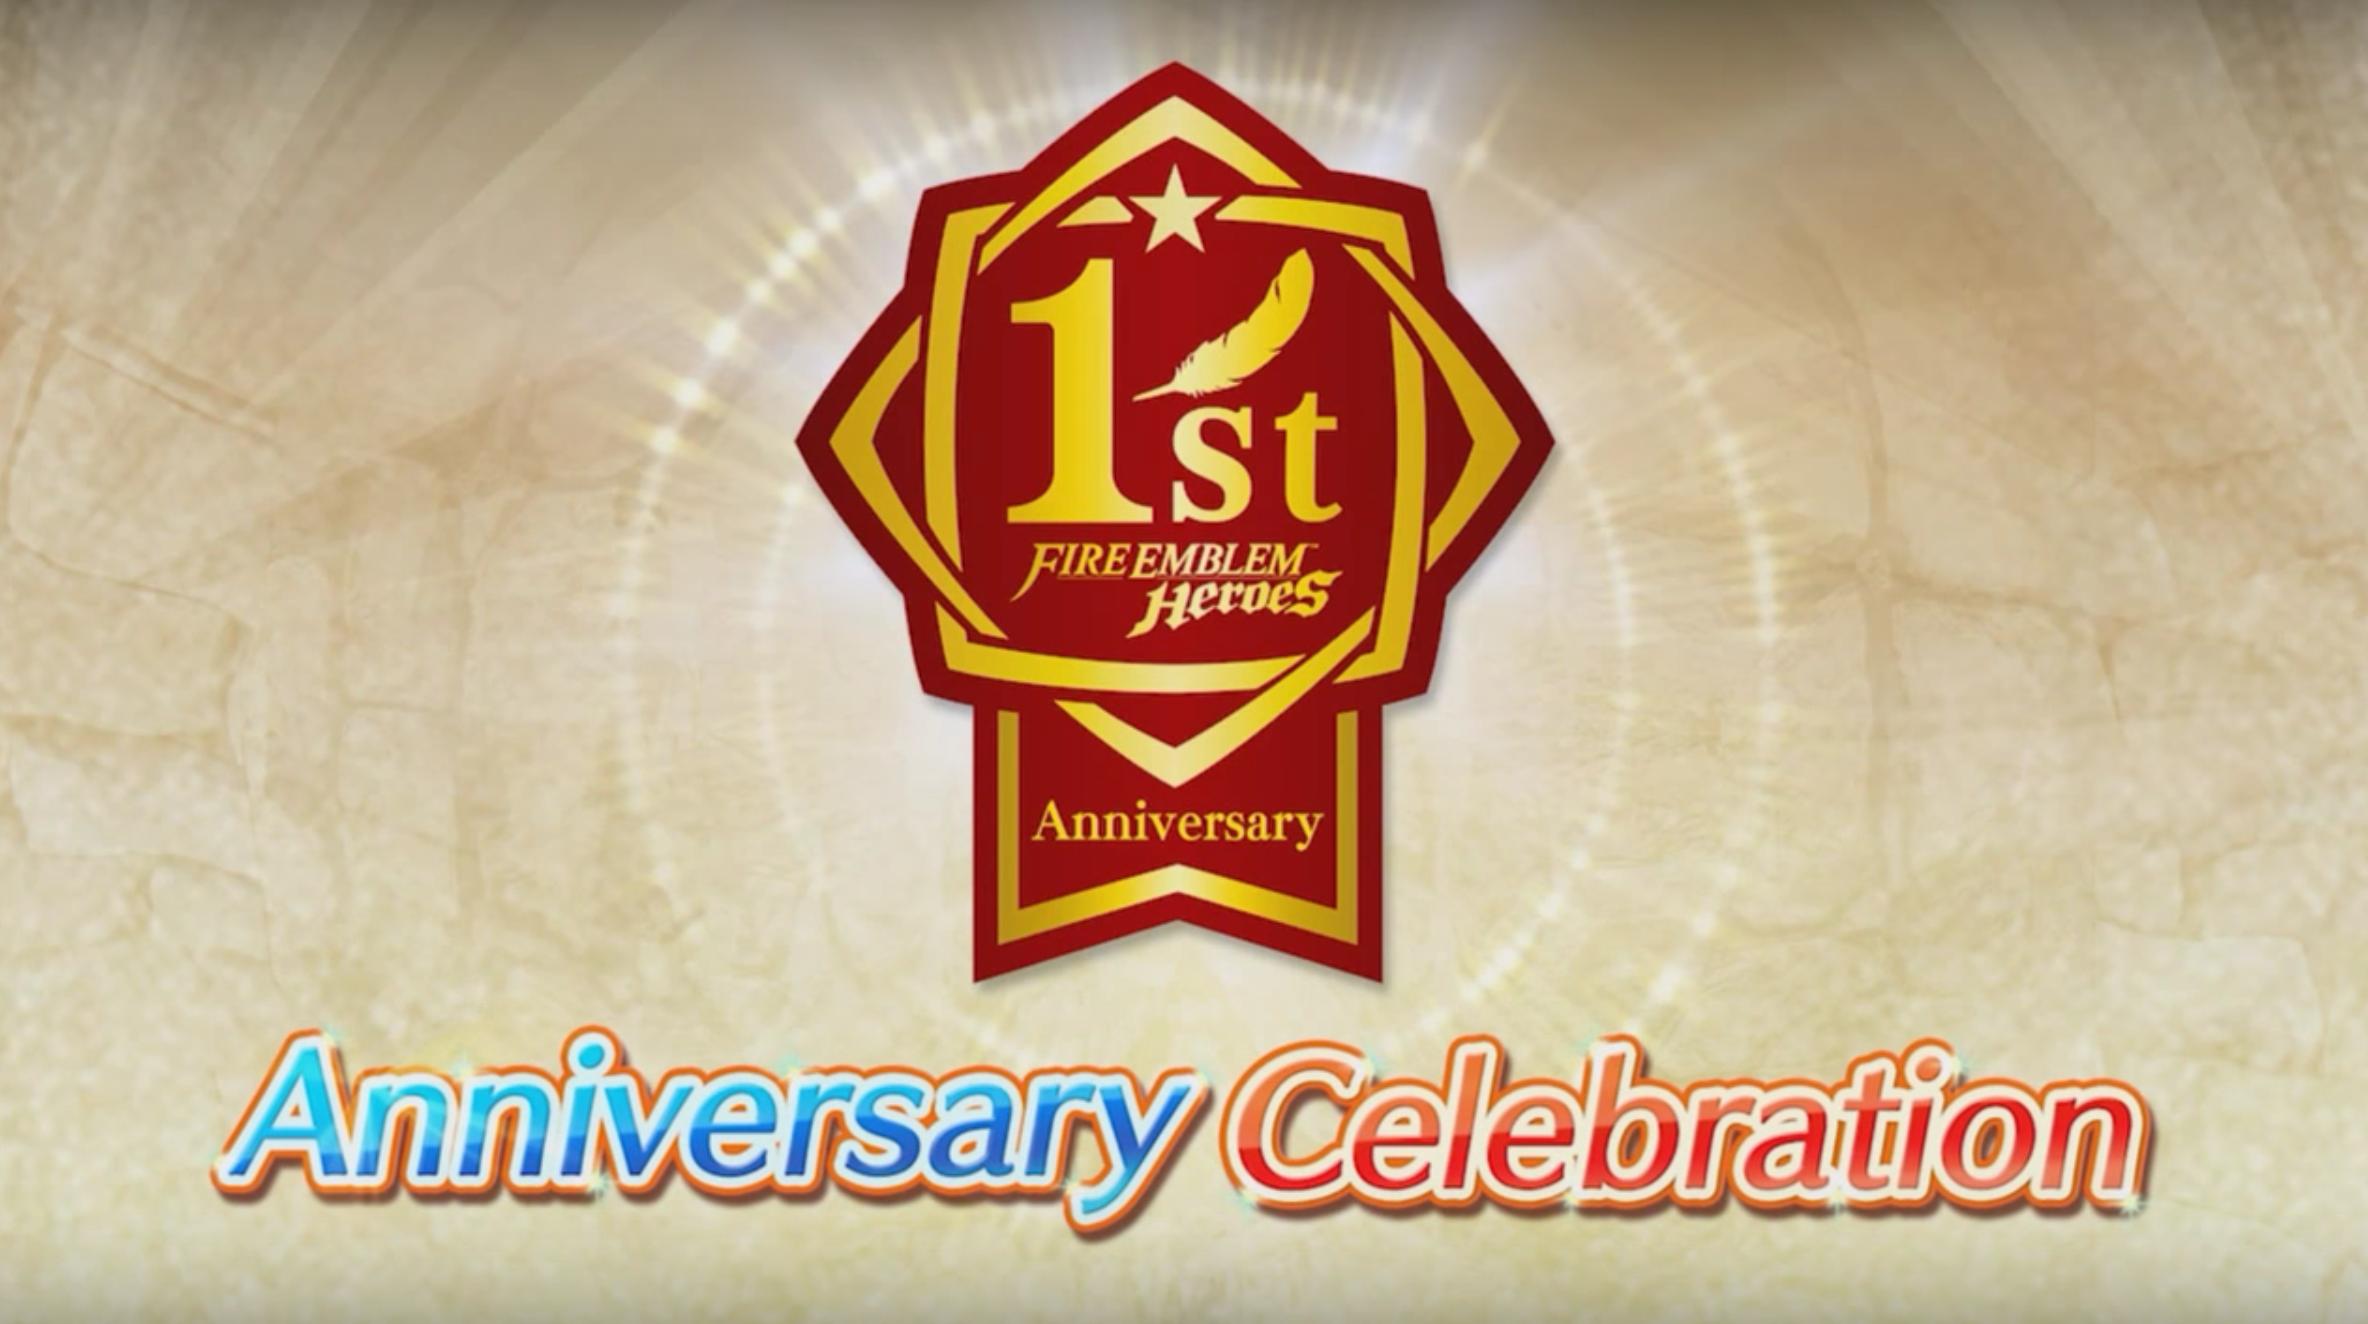 Get First Anniversary 1St Anniversary Logo